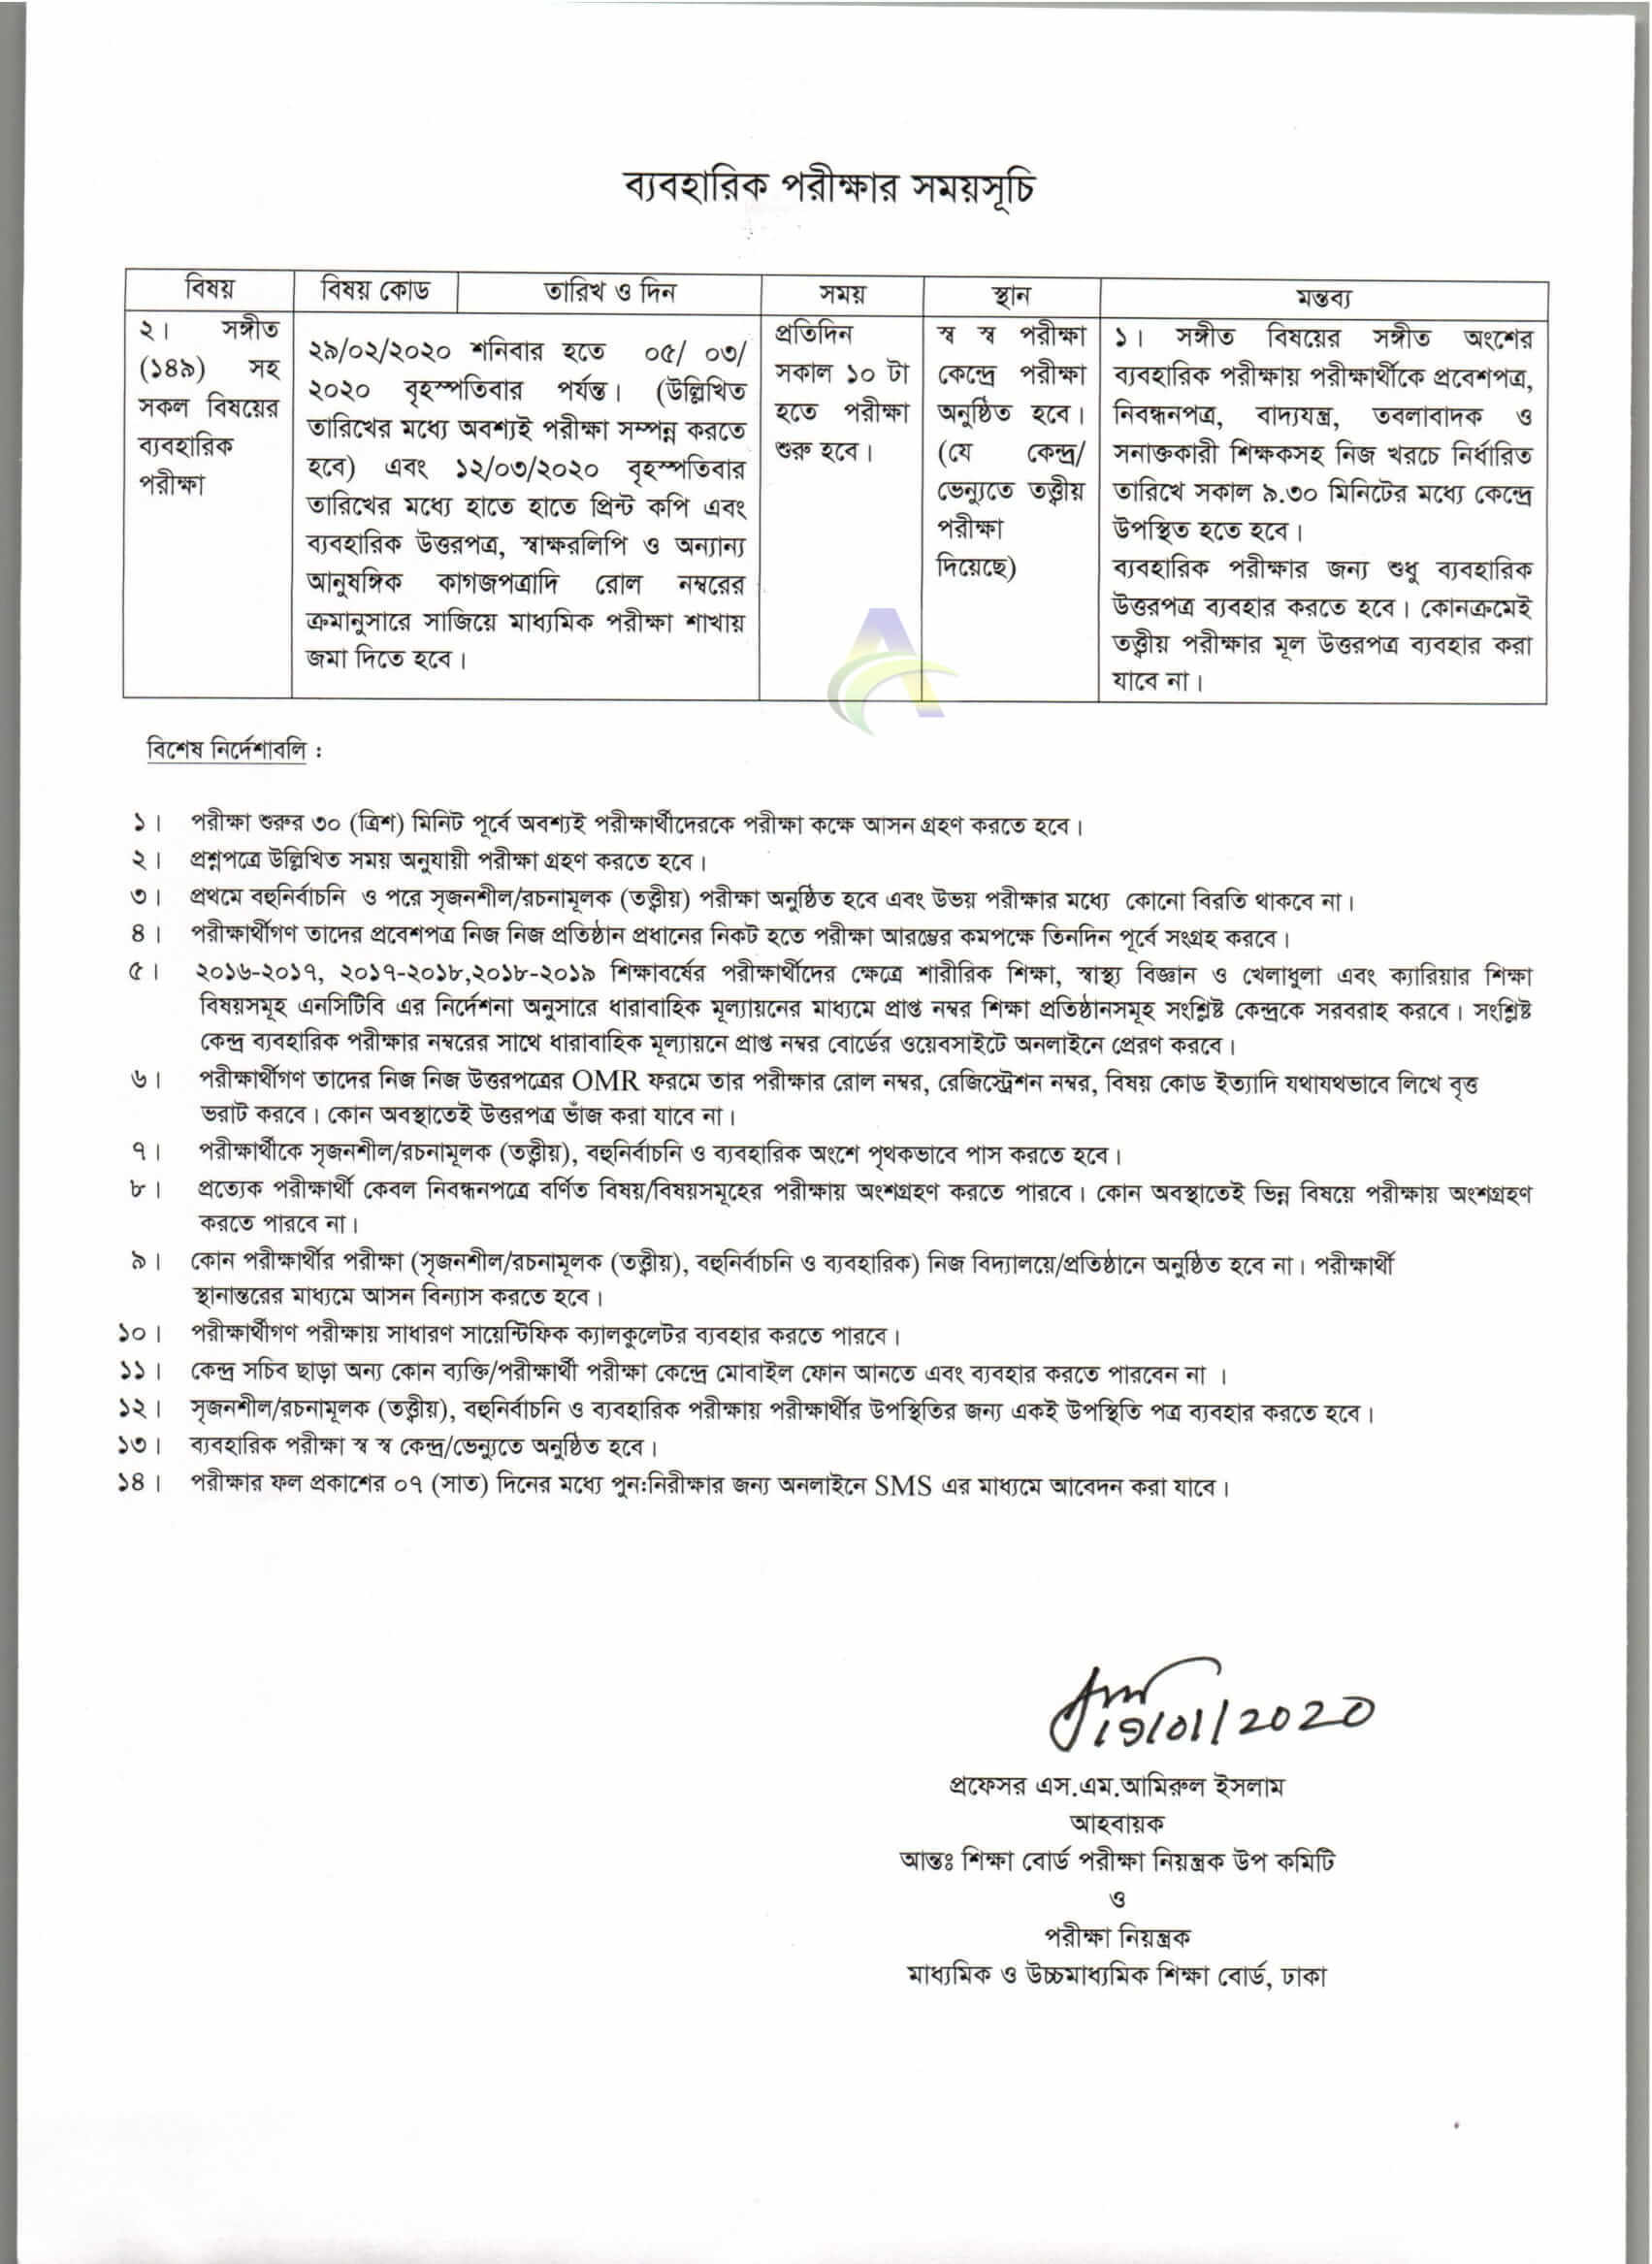 New SSC Routine 2021 PDF